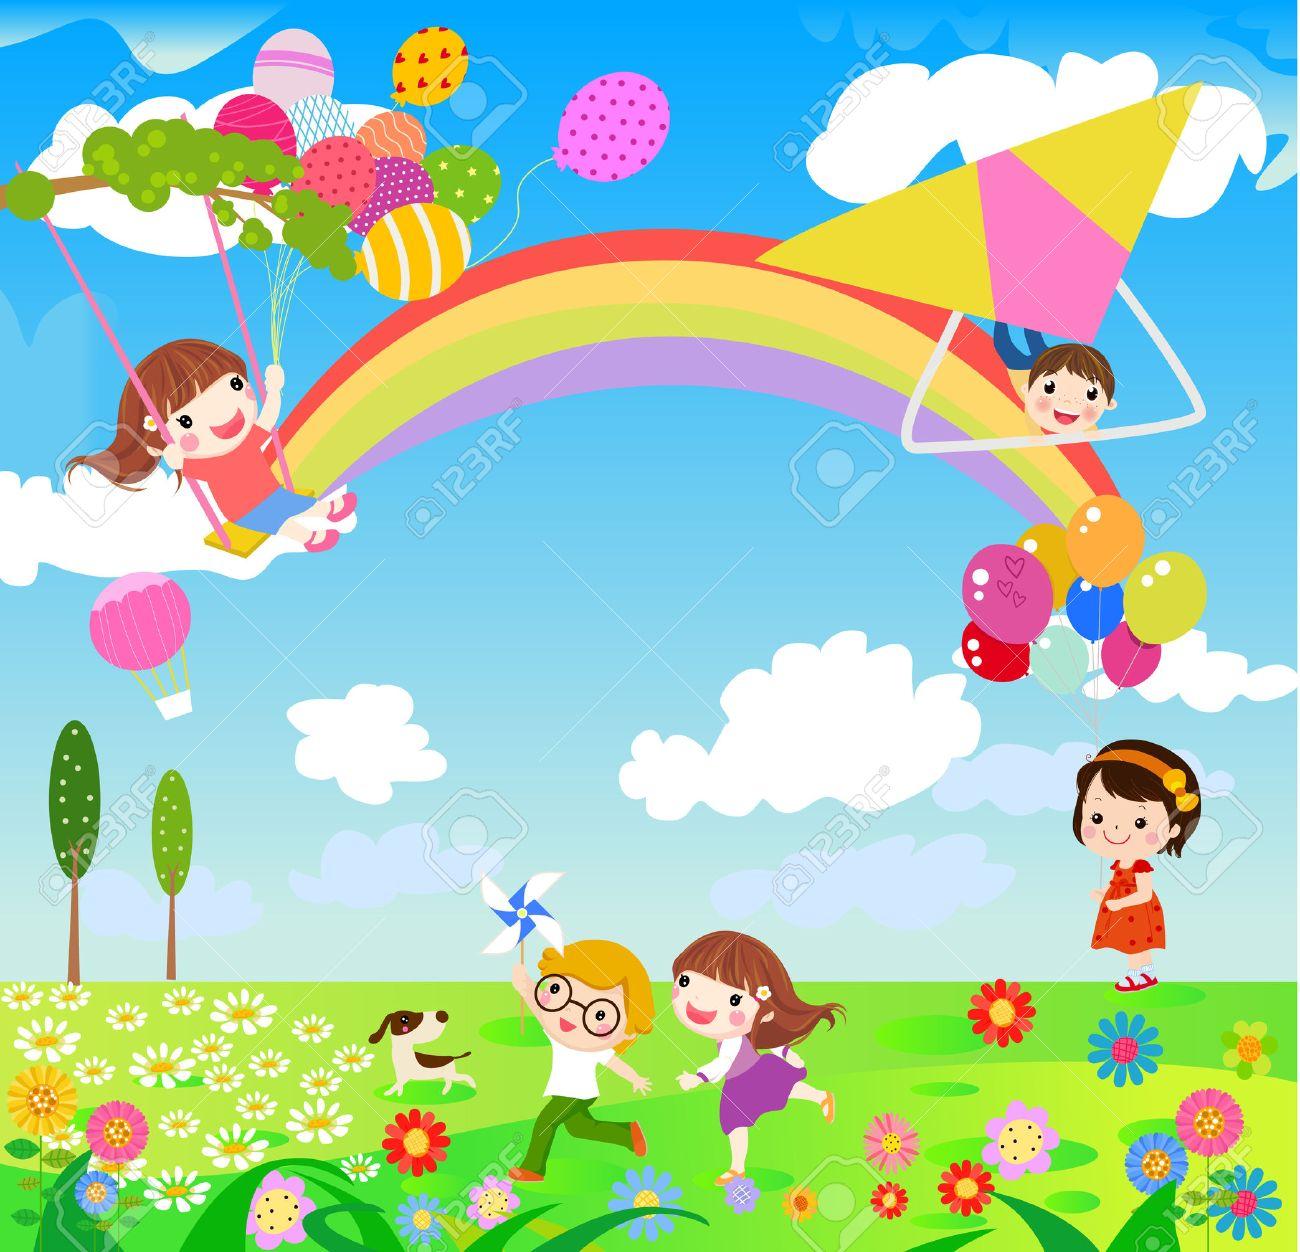 Illustration Of Children Having Fun Playing Outdoor During Spring ...